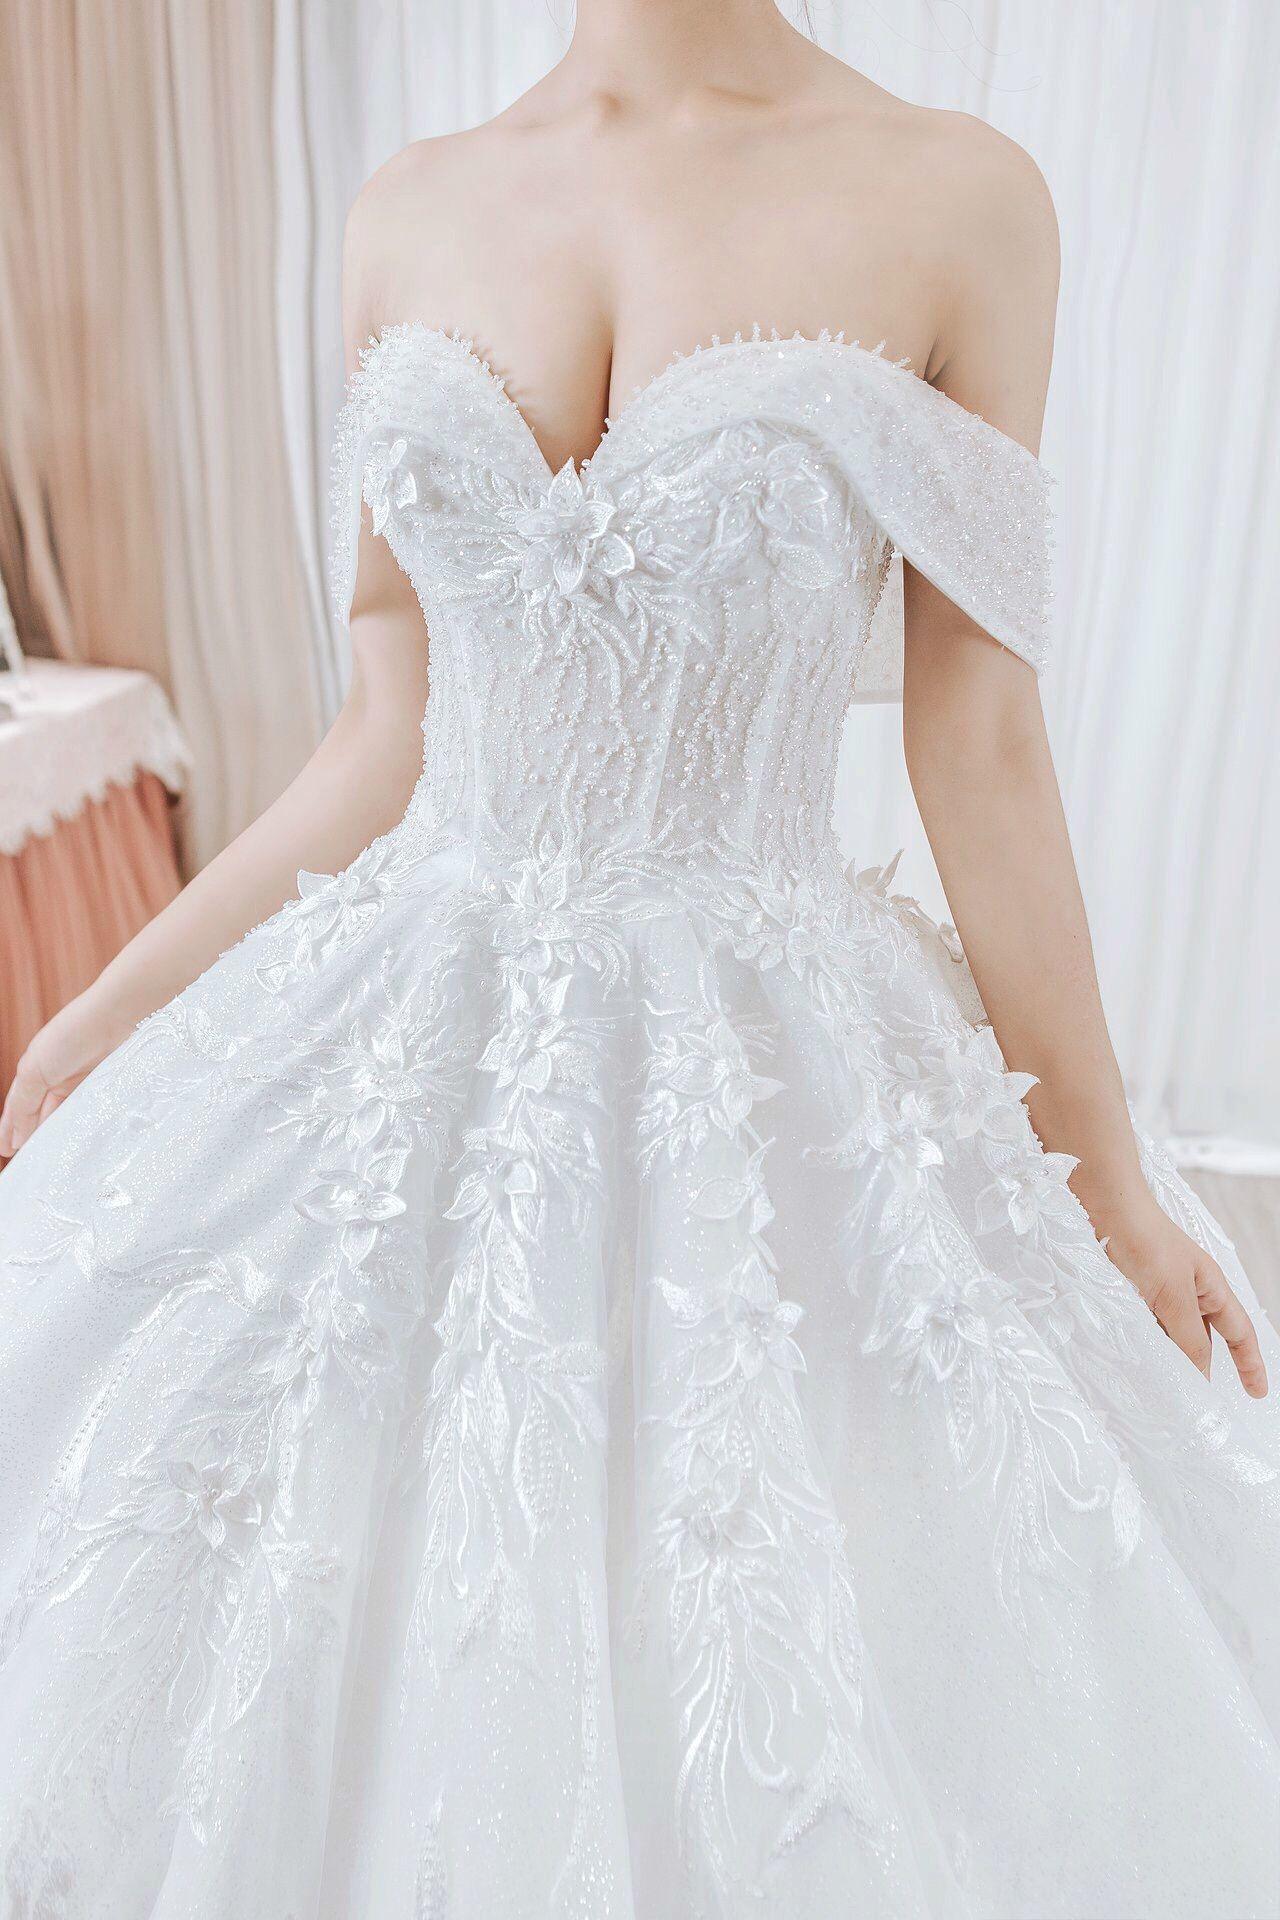 Dramatic Ballgown Wedding Dress Wedding Dress Couture Couture Wedding Dress Ballgown Ball Gown Wedding Dress